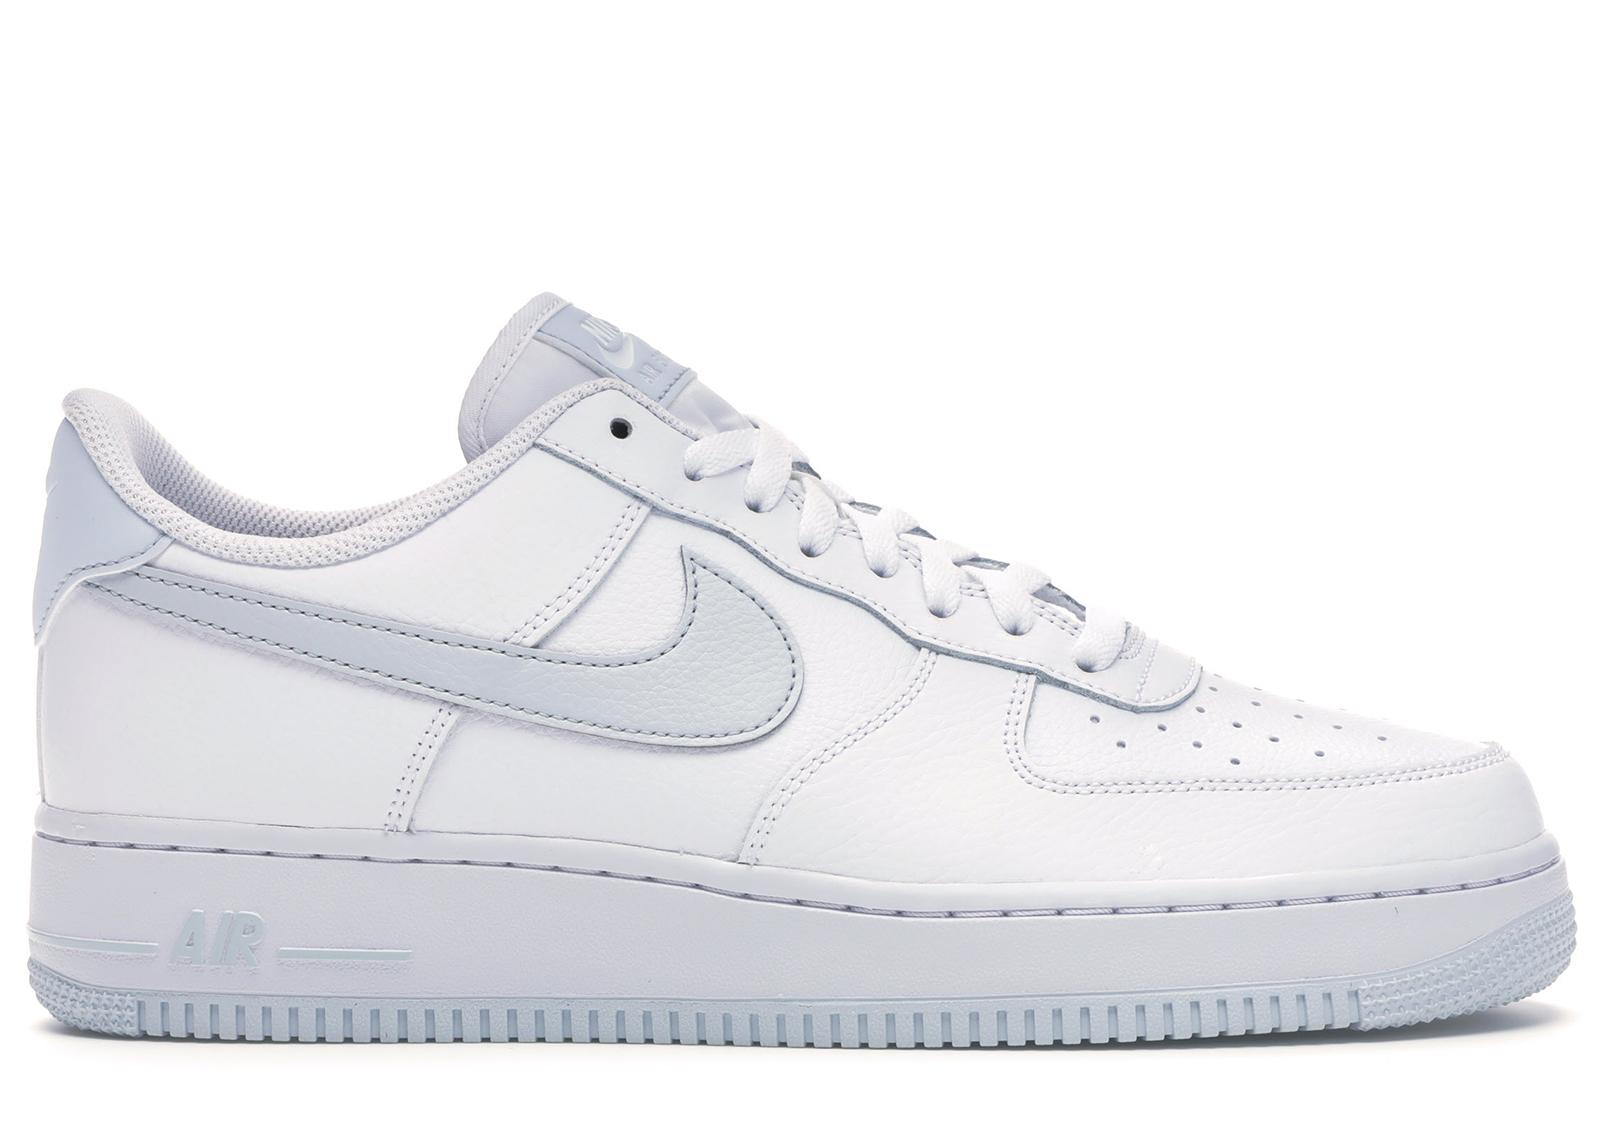 Nike Air Force 1 '07 White - CD9066-100